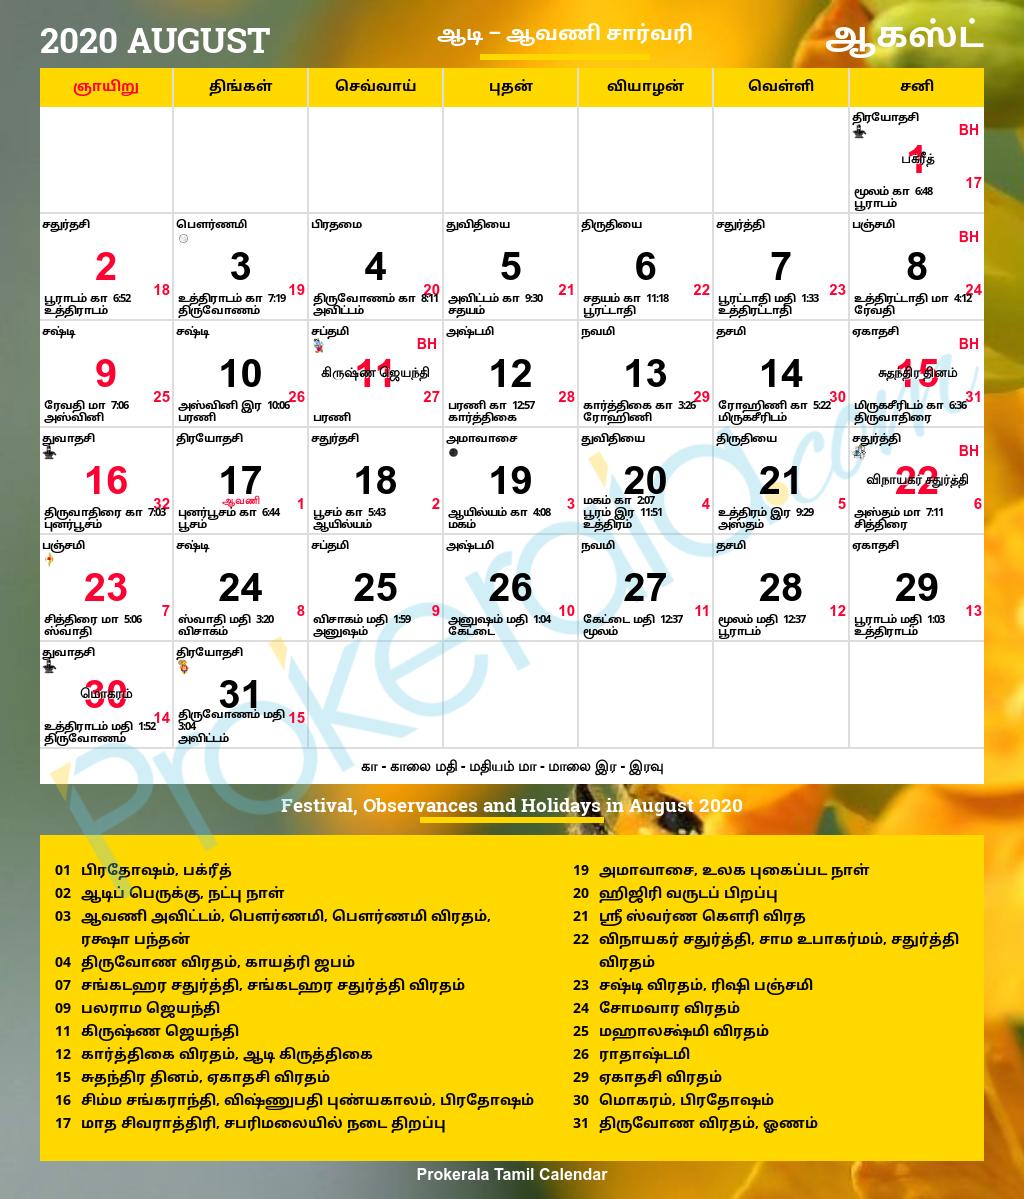 Tamil Calendar 2020, August